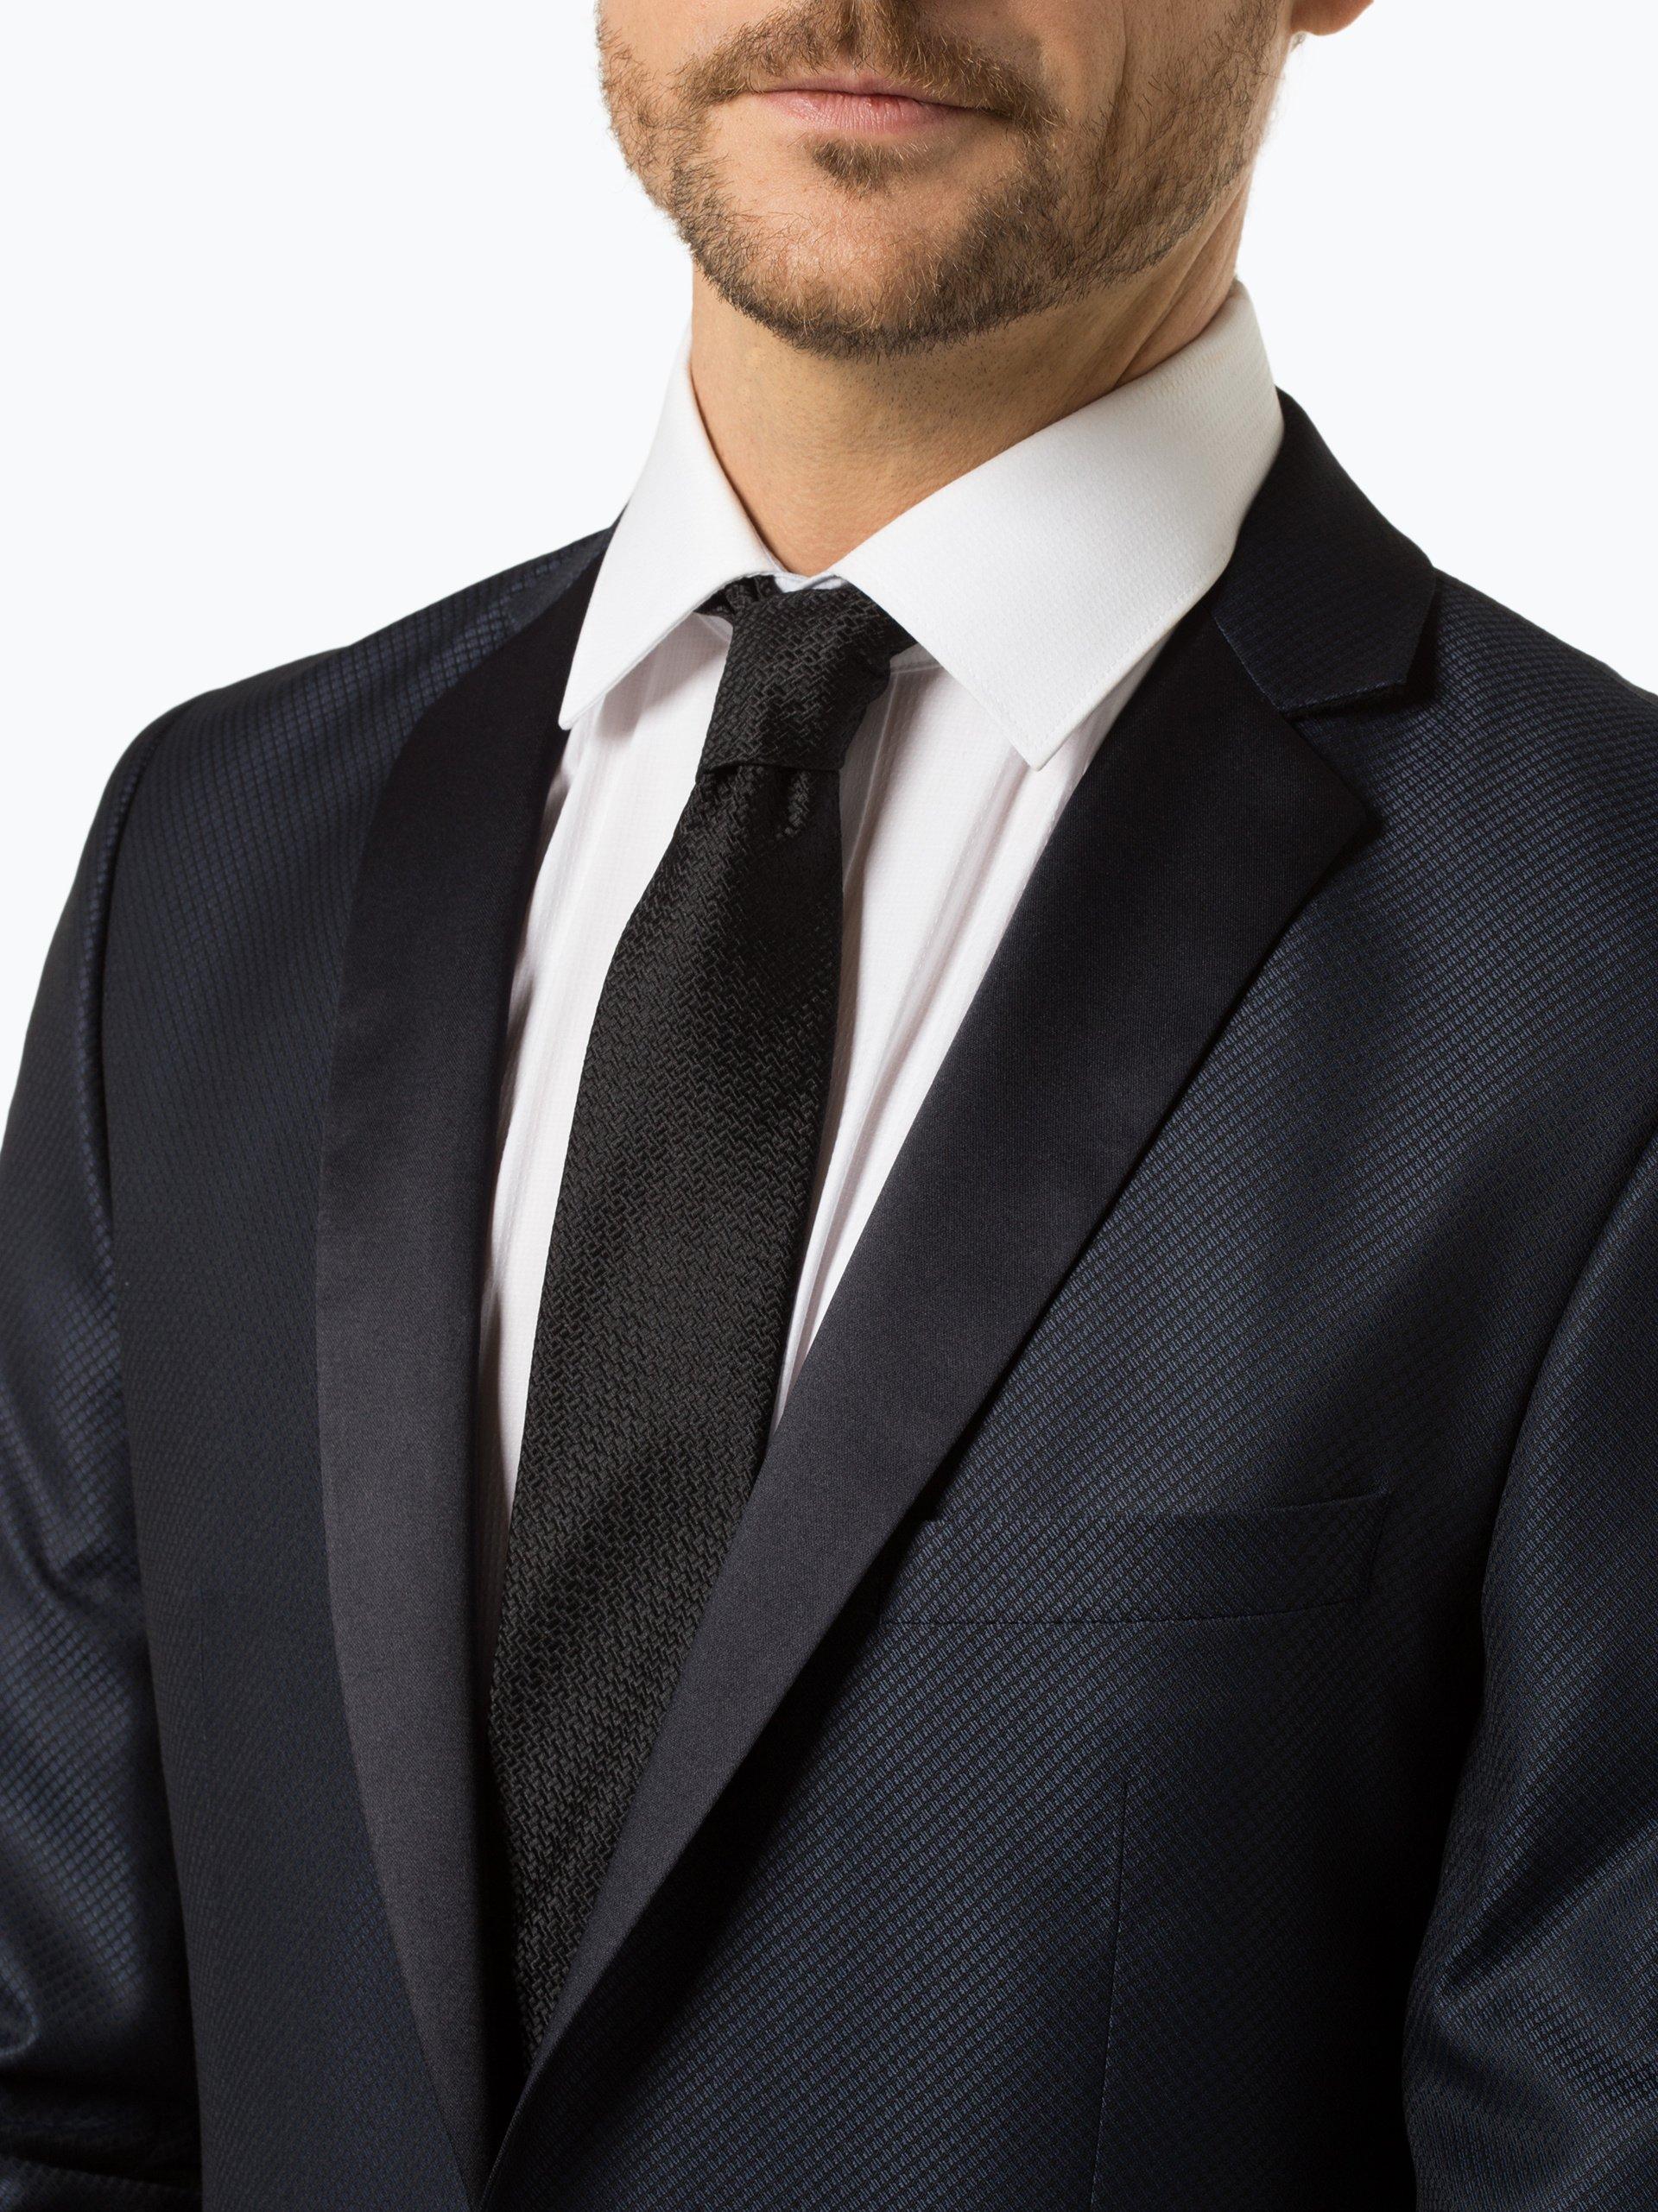 Finshley & Harding London Herren Anzug - James Cook